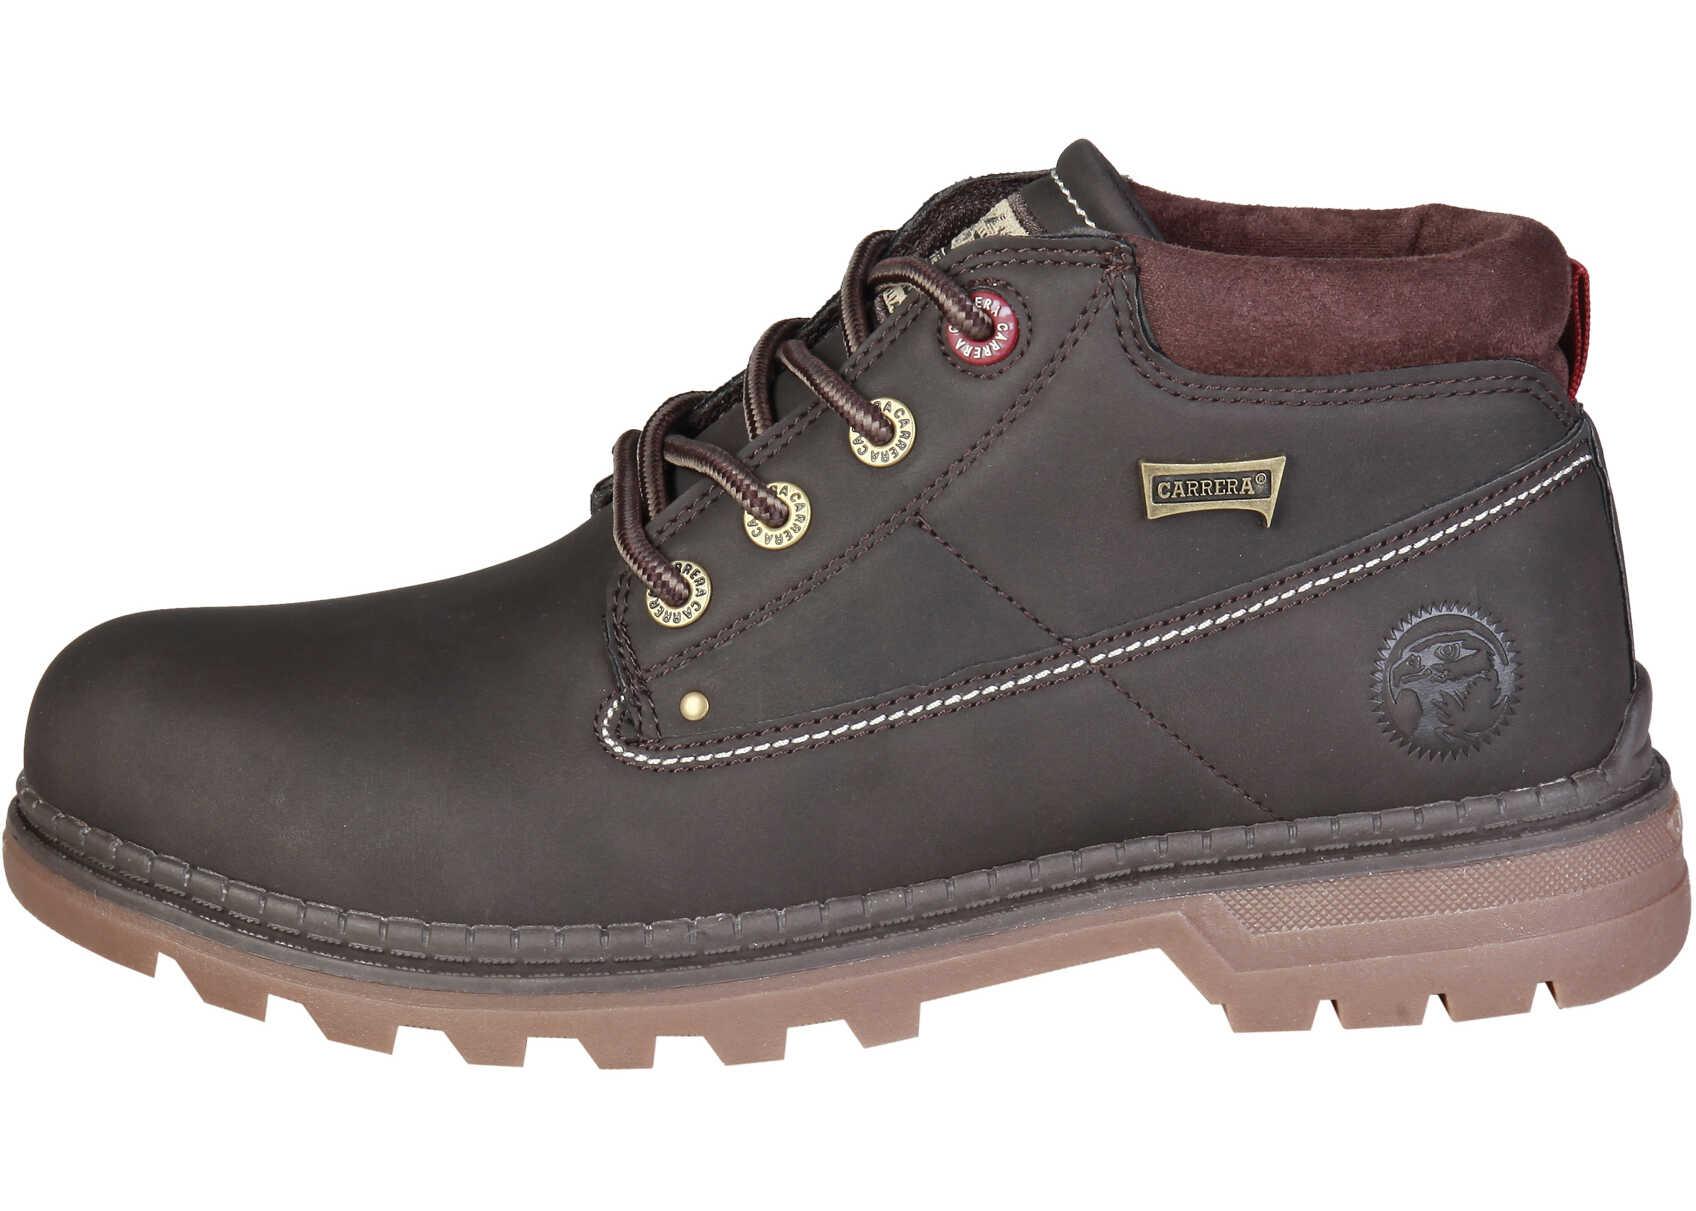 Carrera Jeans Chukka_Cam721055 Brown